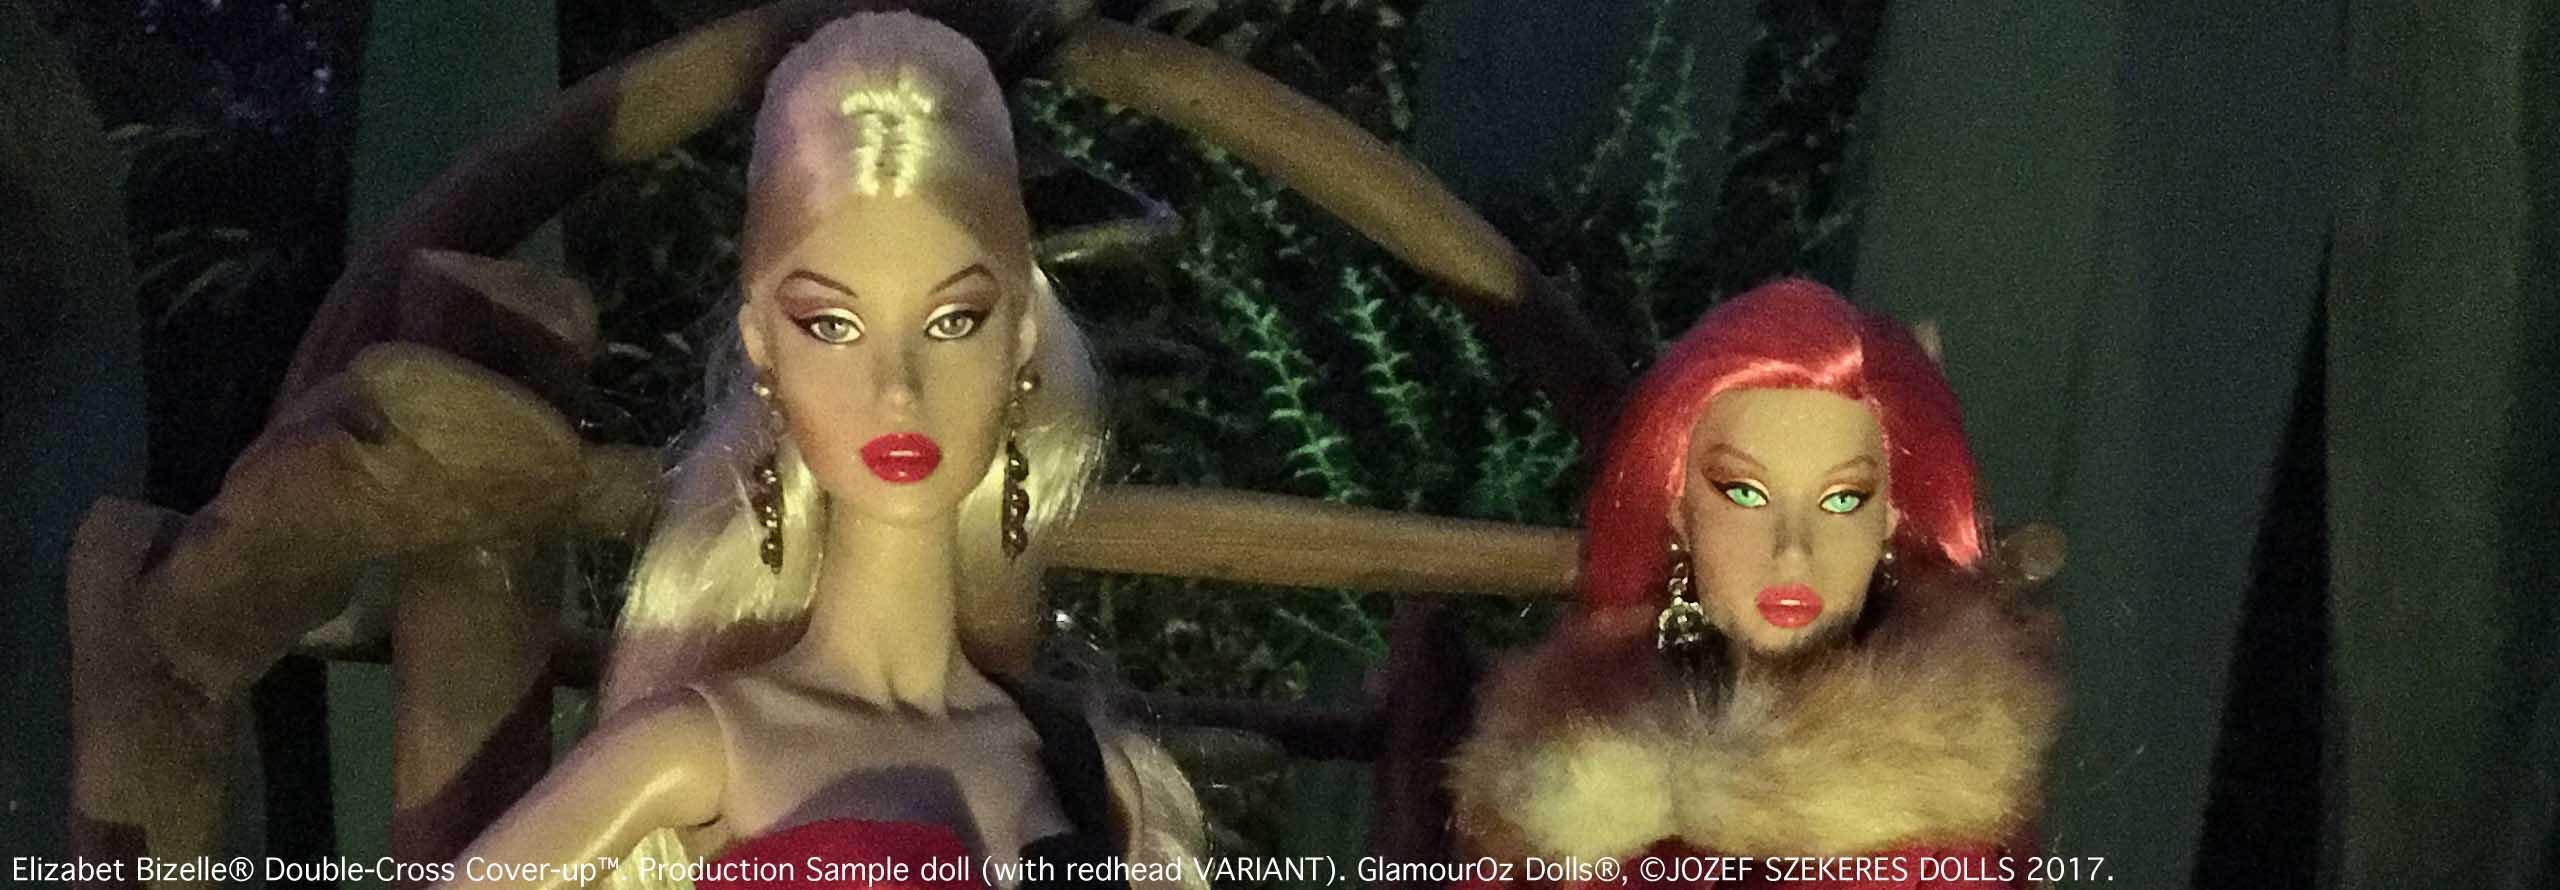 GODs Slider 8.Elizabet Bizelle® Double-Cross Cover-Up™.Production Sample doll